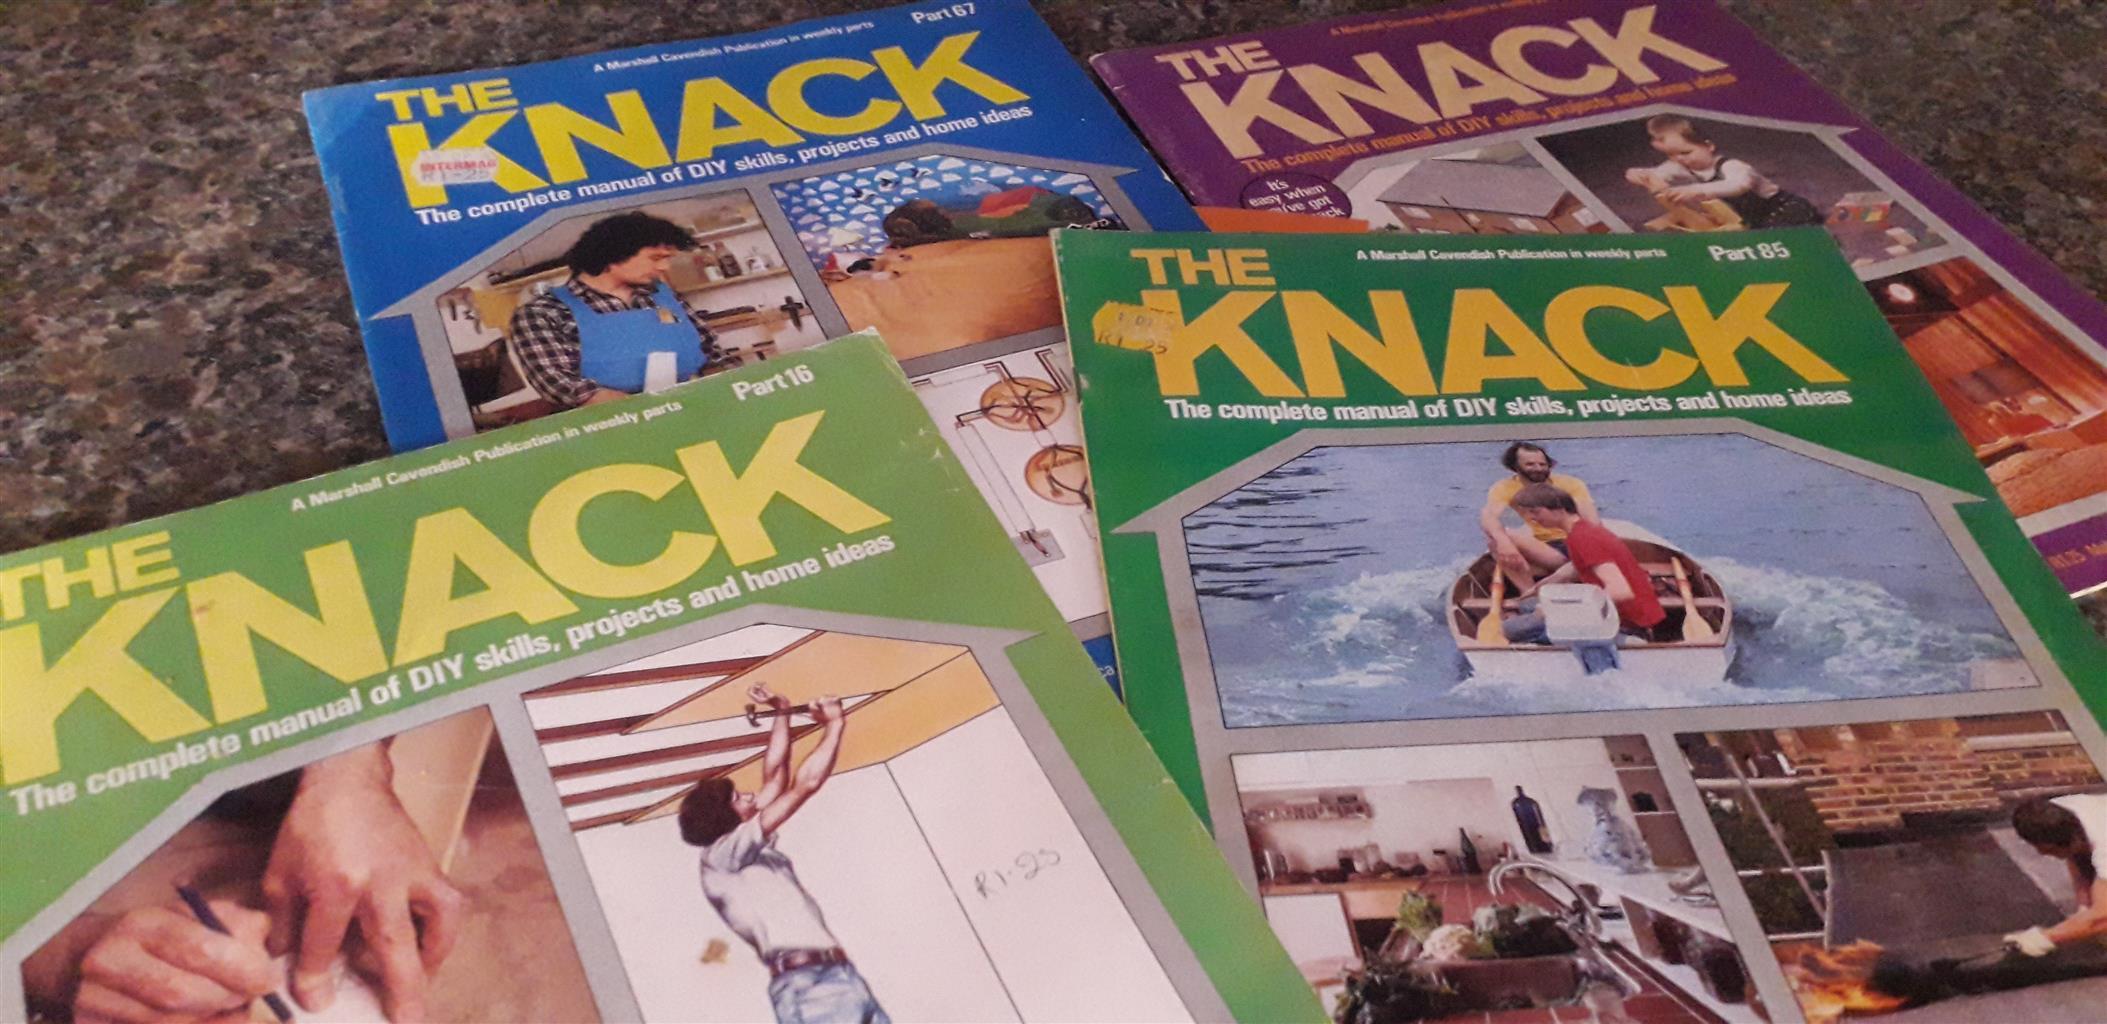 The Knack Book